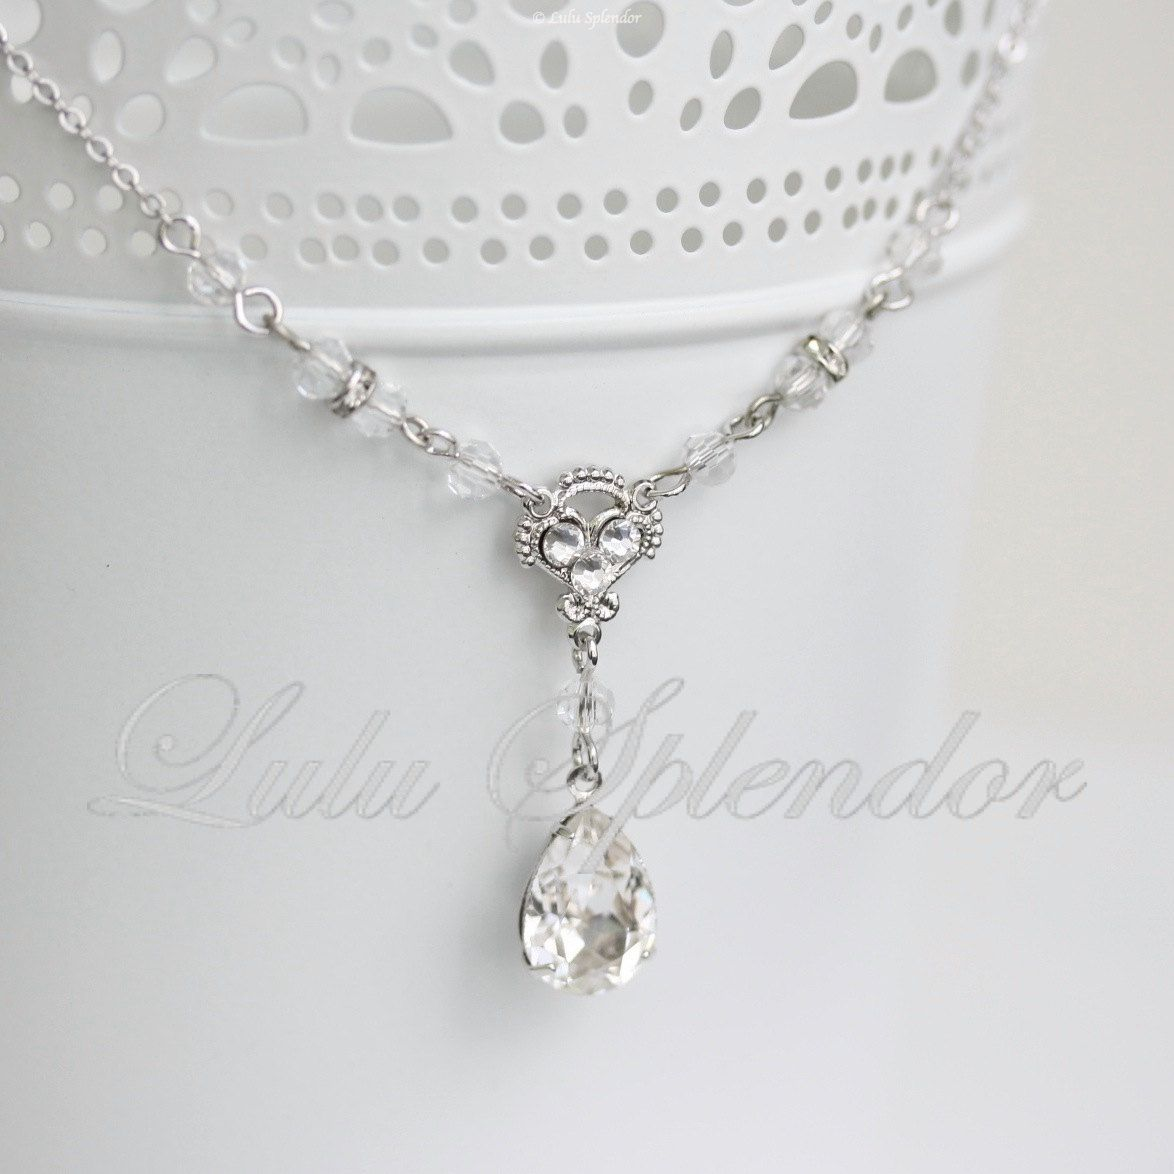 Wedding Necklace Crystal Pendant Chain Rhinestone Drop Bridal Simple Jewelry Jane 49 00 Via Etsy